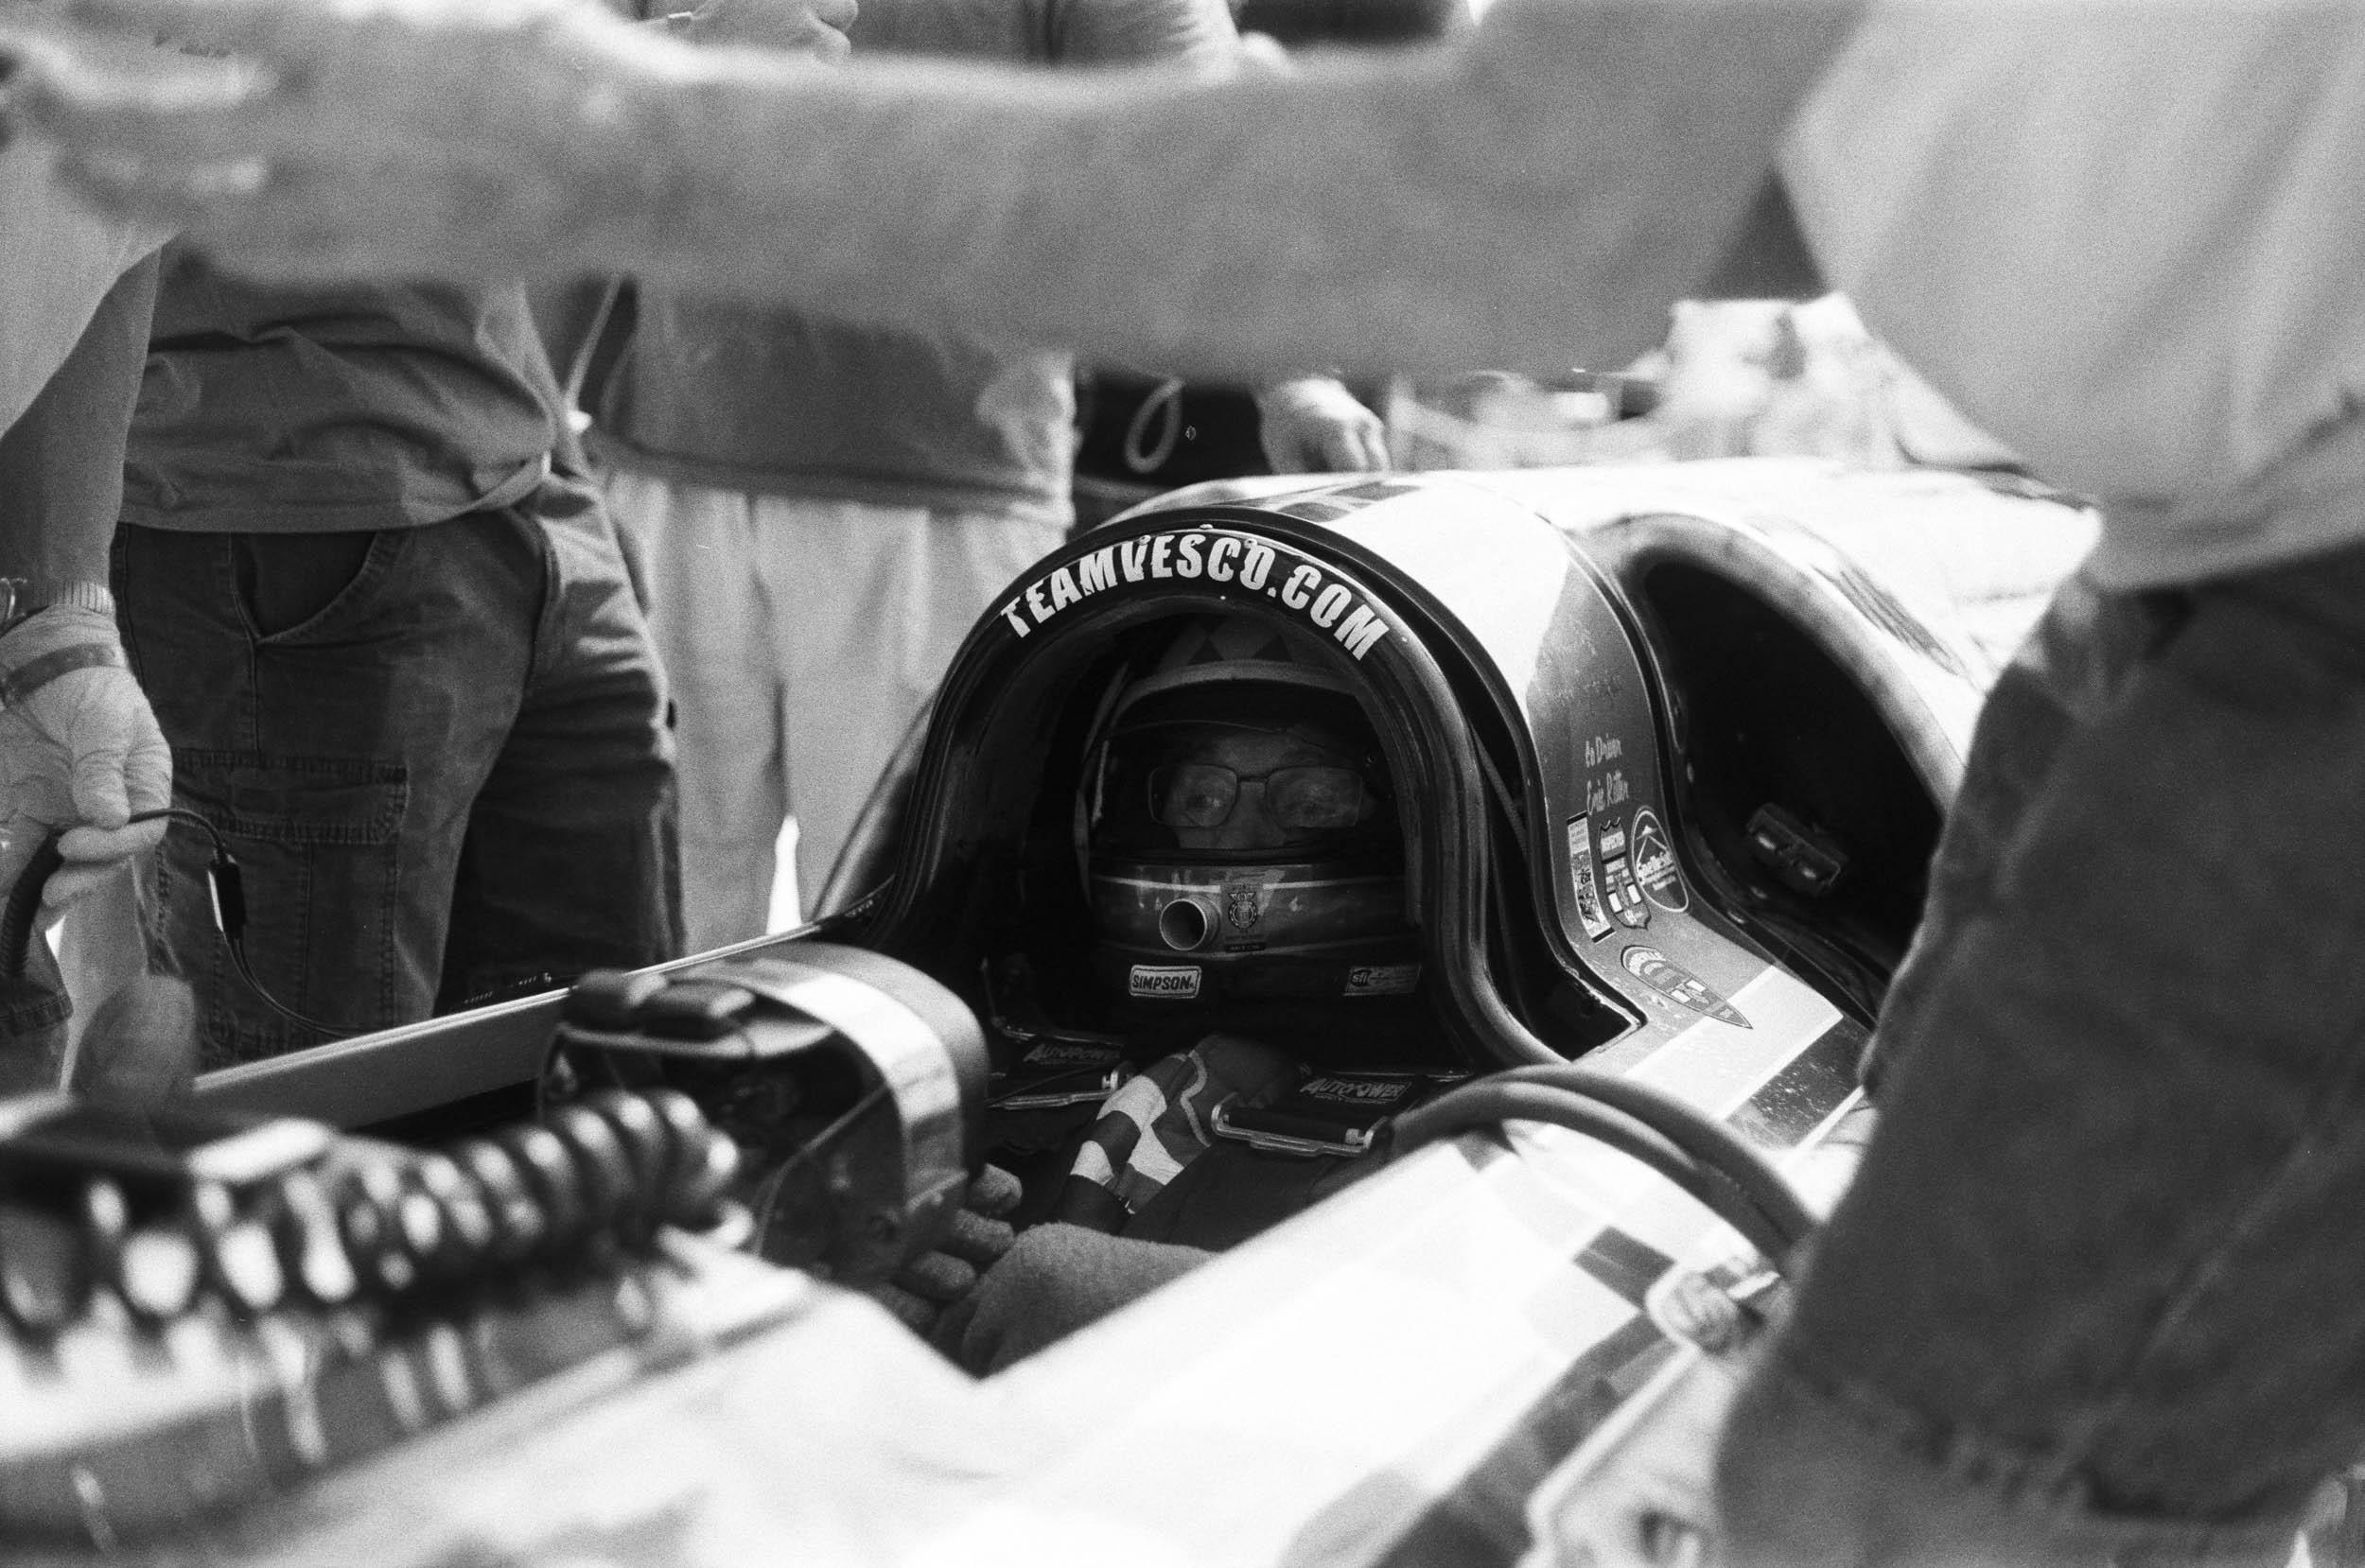 Dave Spangler awaits his turn inside the cockpit of the Turbinator II